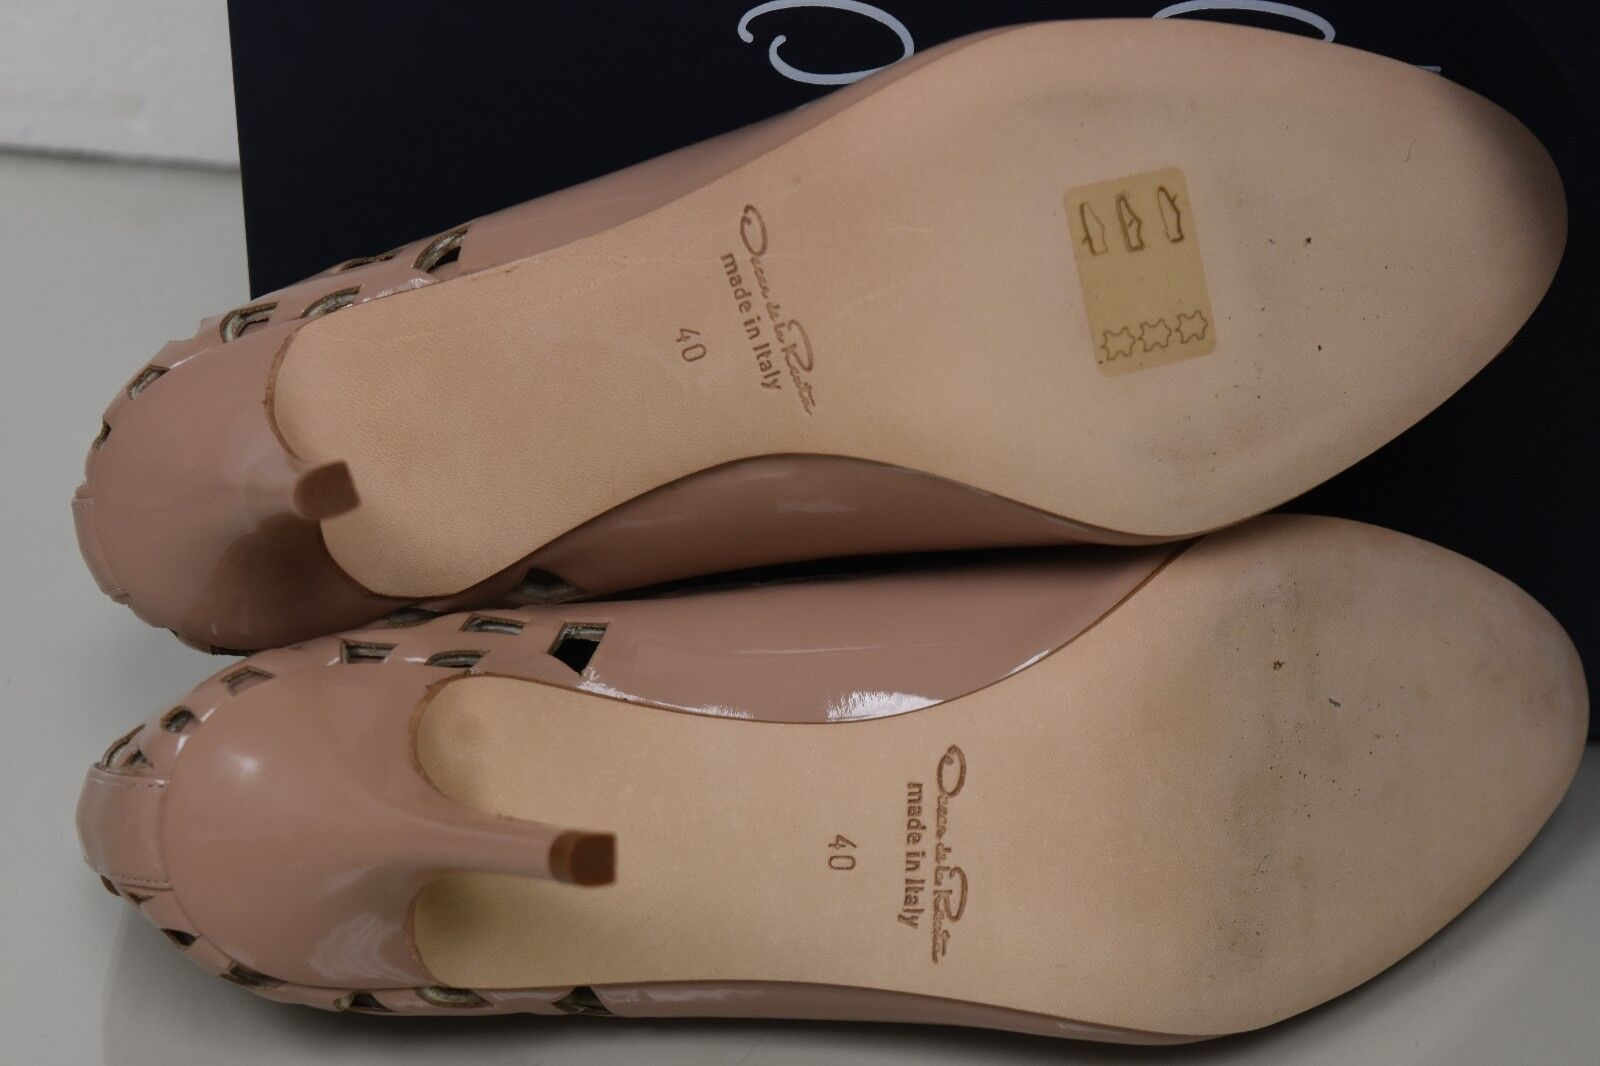 Neuf Oscar Oscar Oscar de la Renta Mlle Elle Coupe Laser Beige Chair Chaussures Vernies 40 8f4b6e